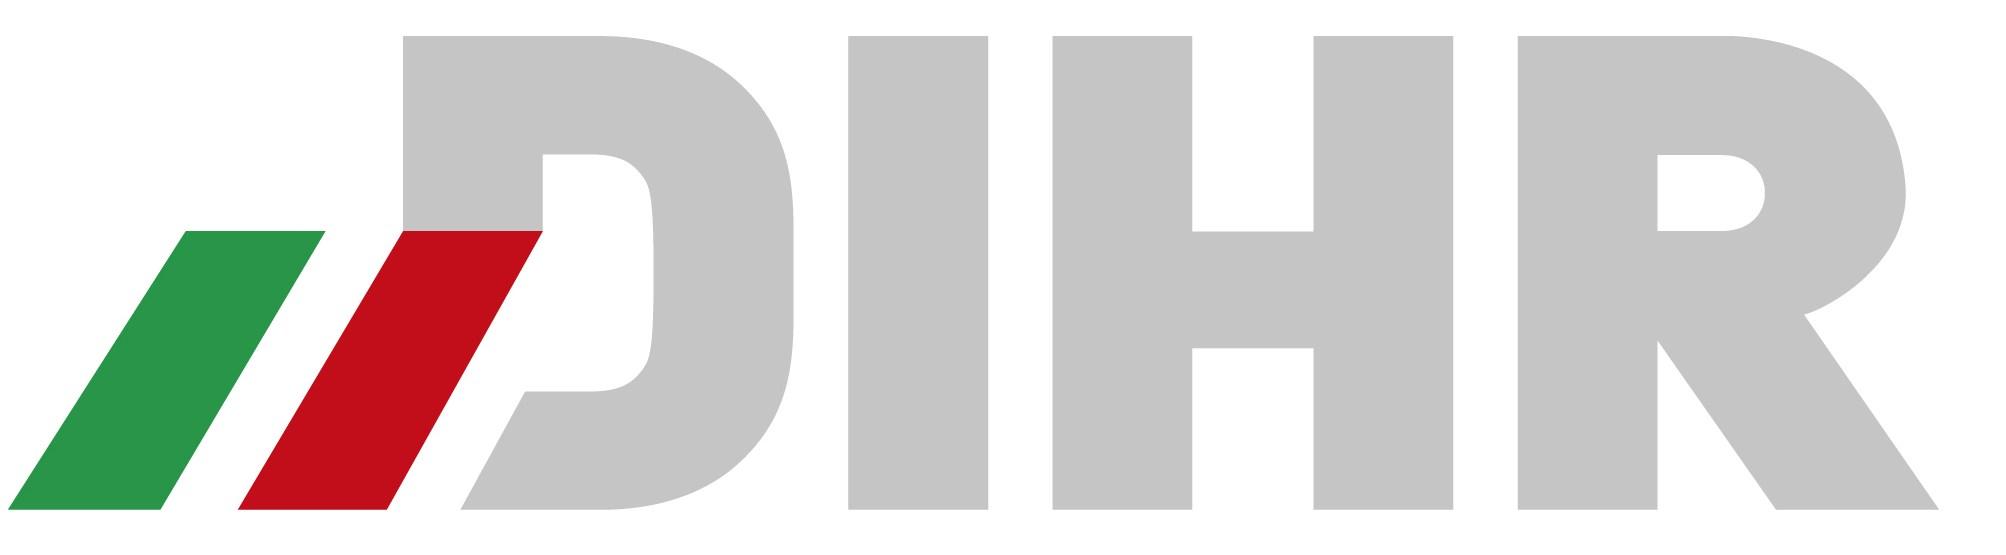 DIHR_logo.jpg